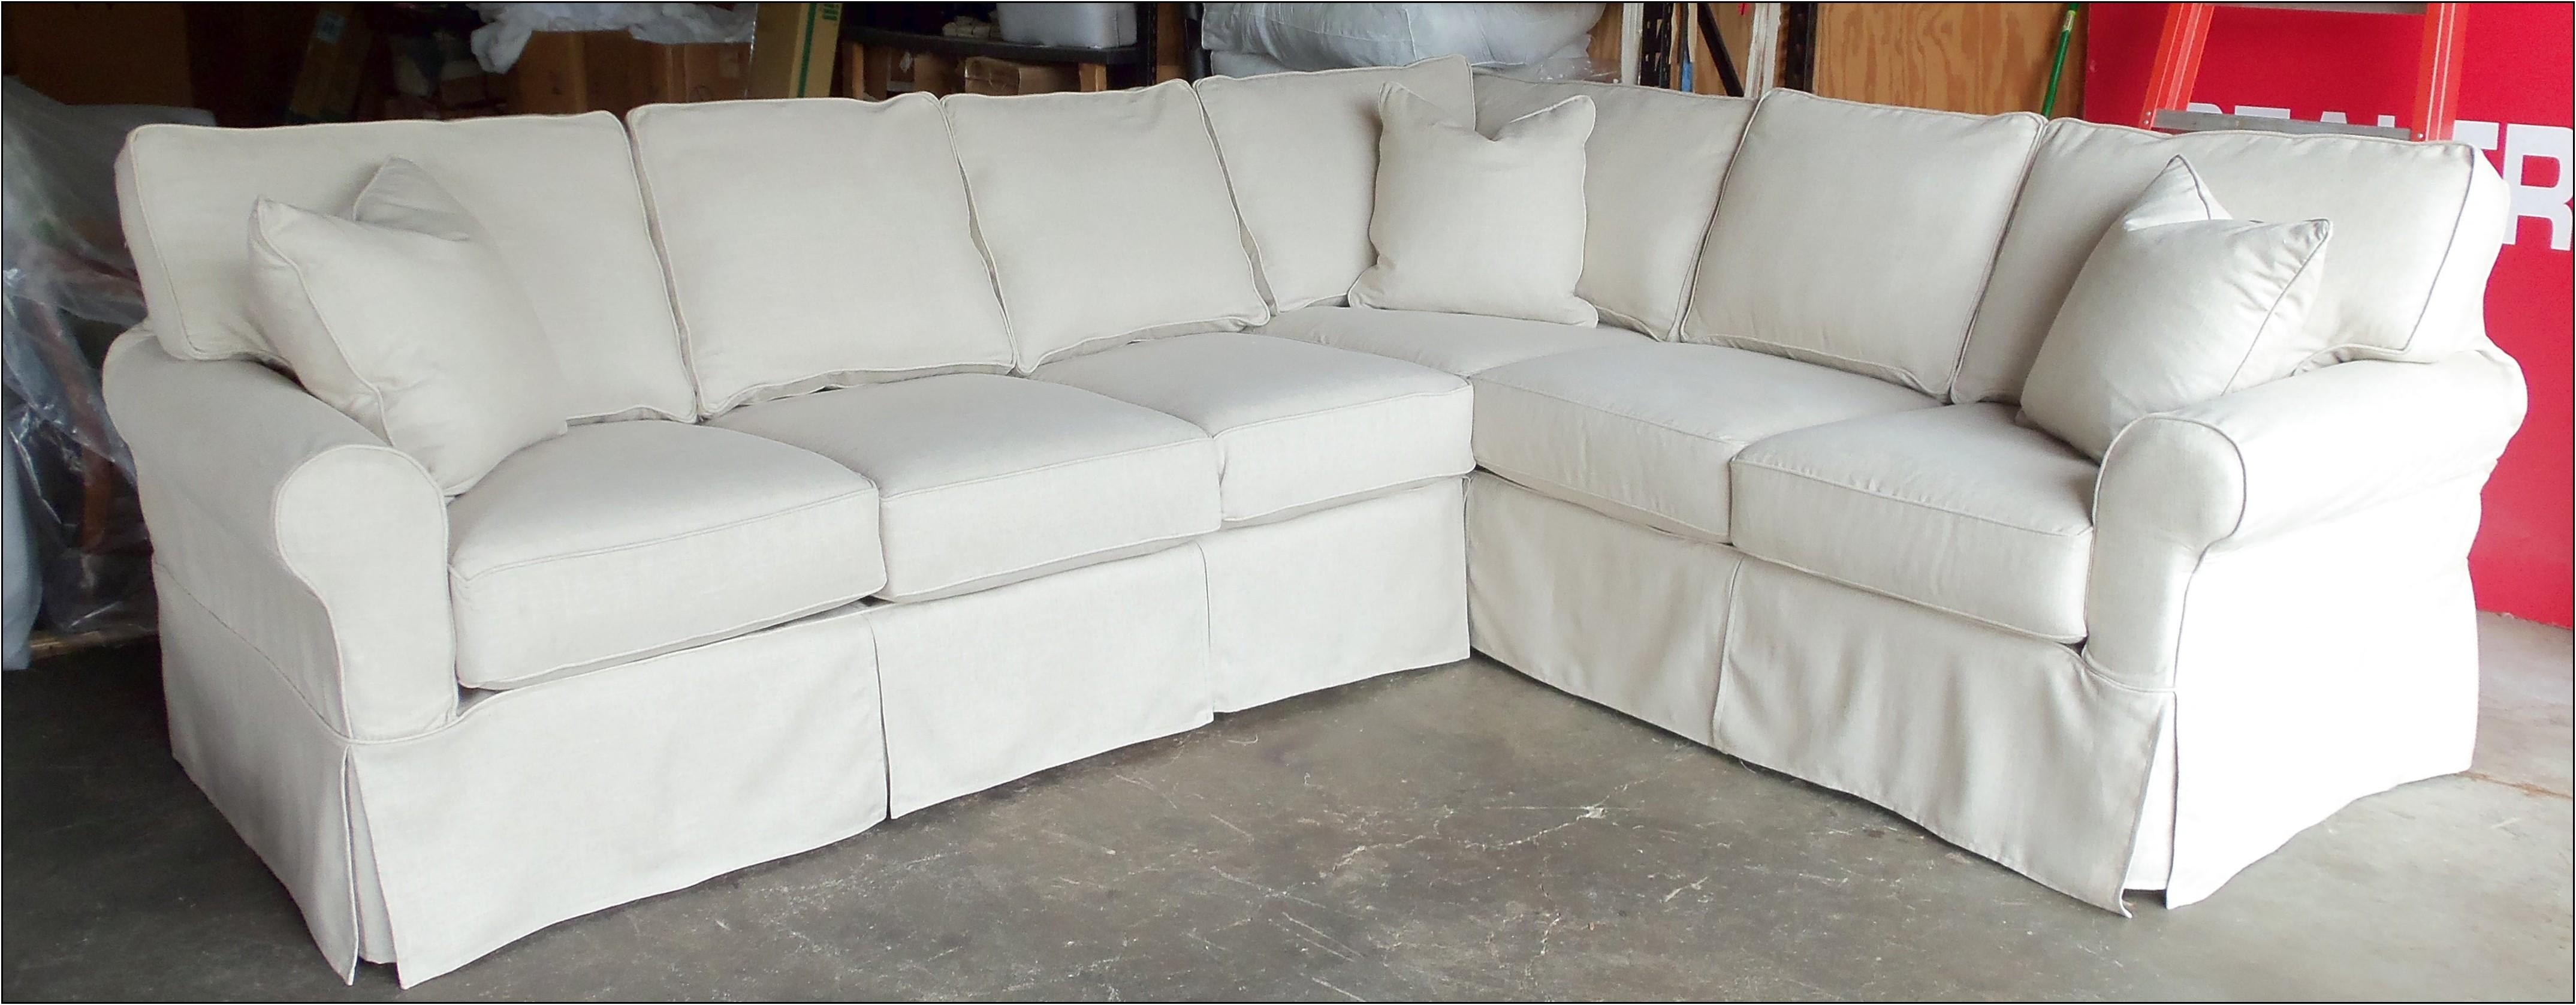 sleeper sofa pottery barn brown leather paint 2019 latest 3 piece sectional ideas